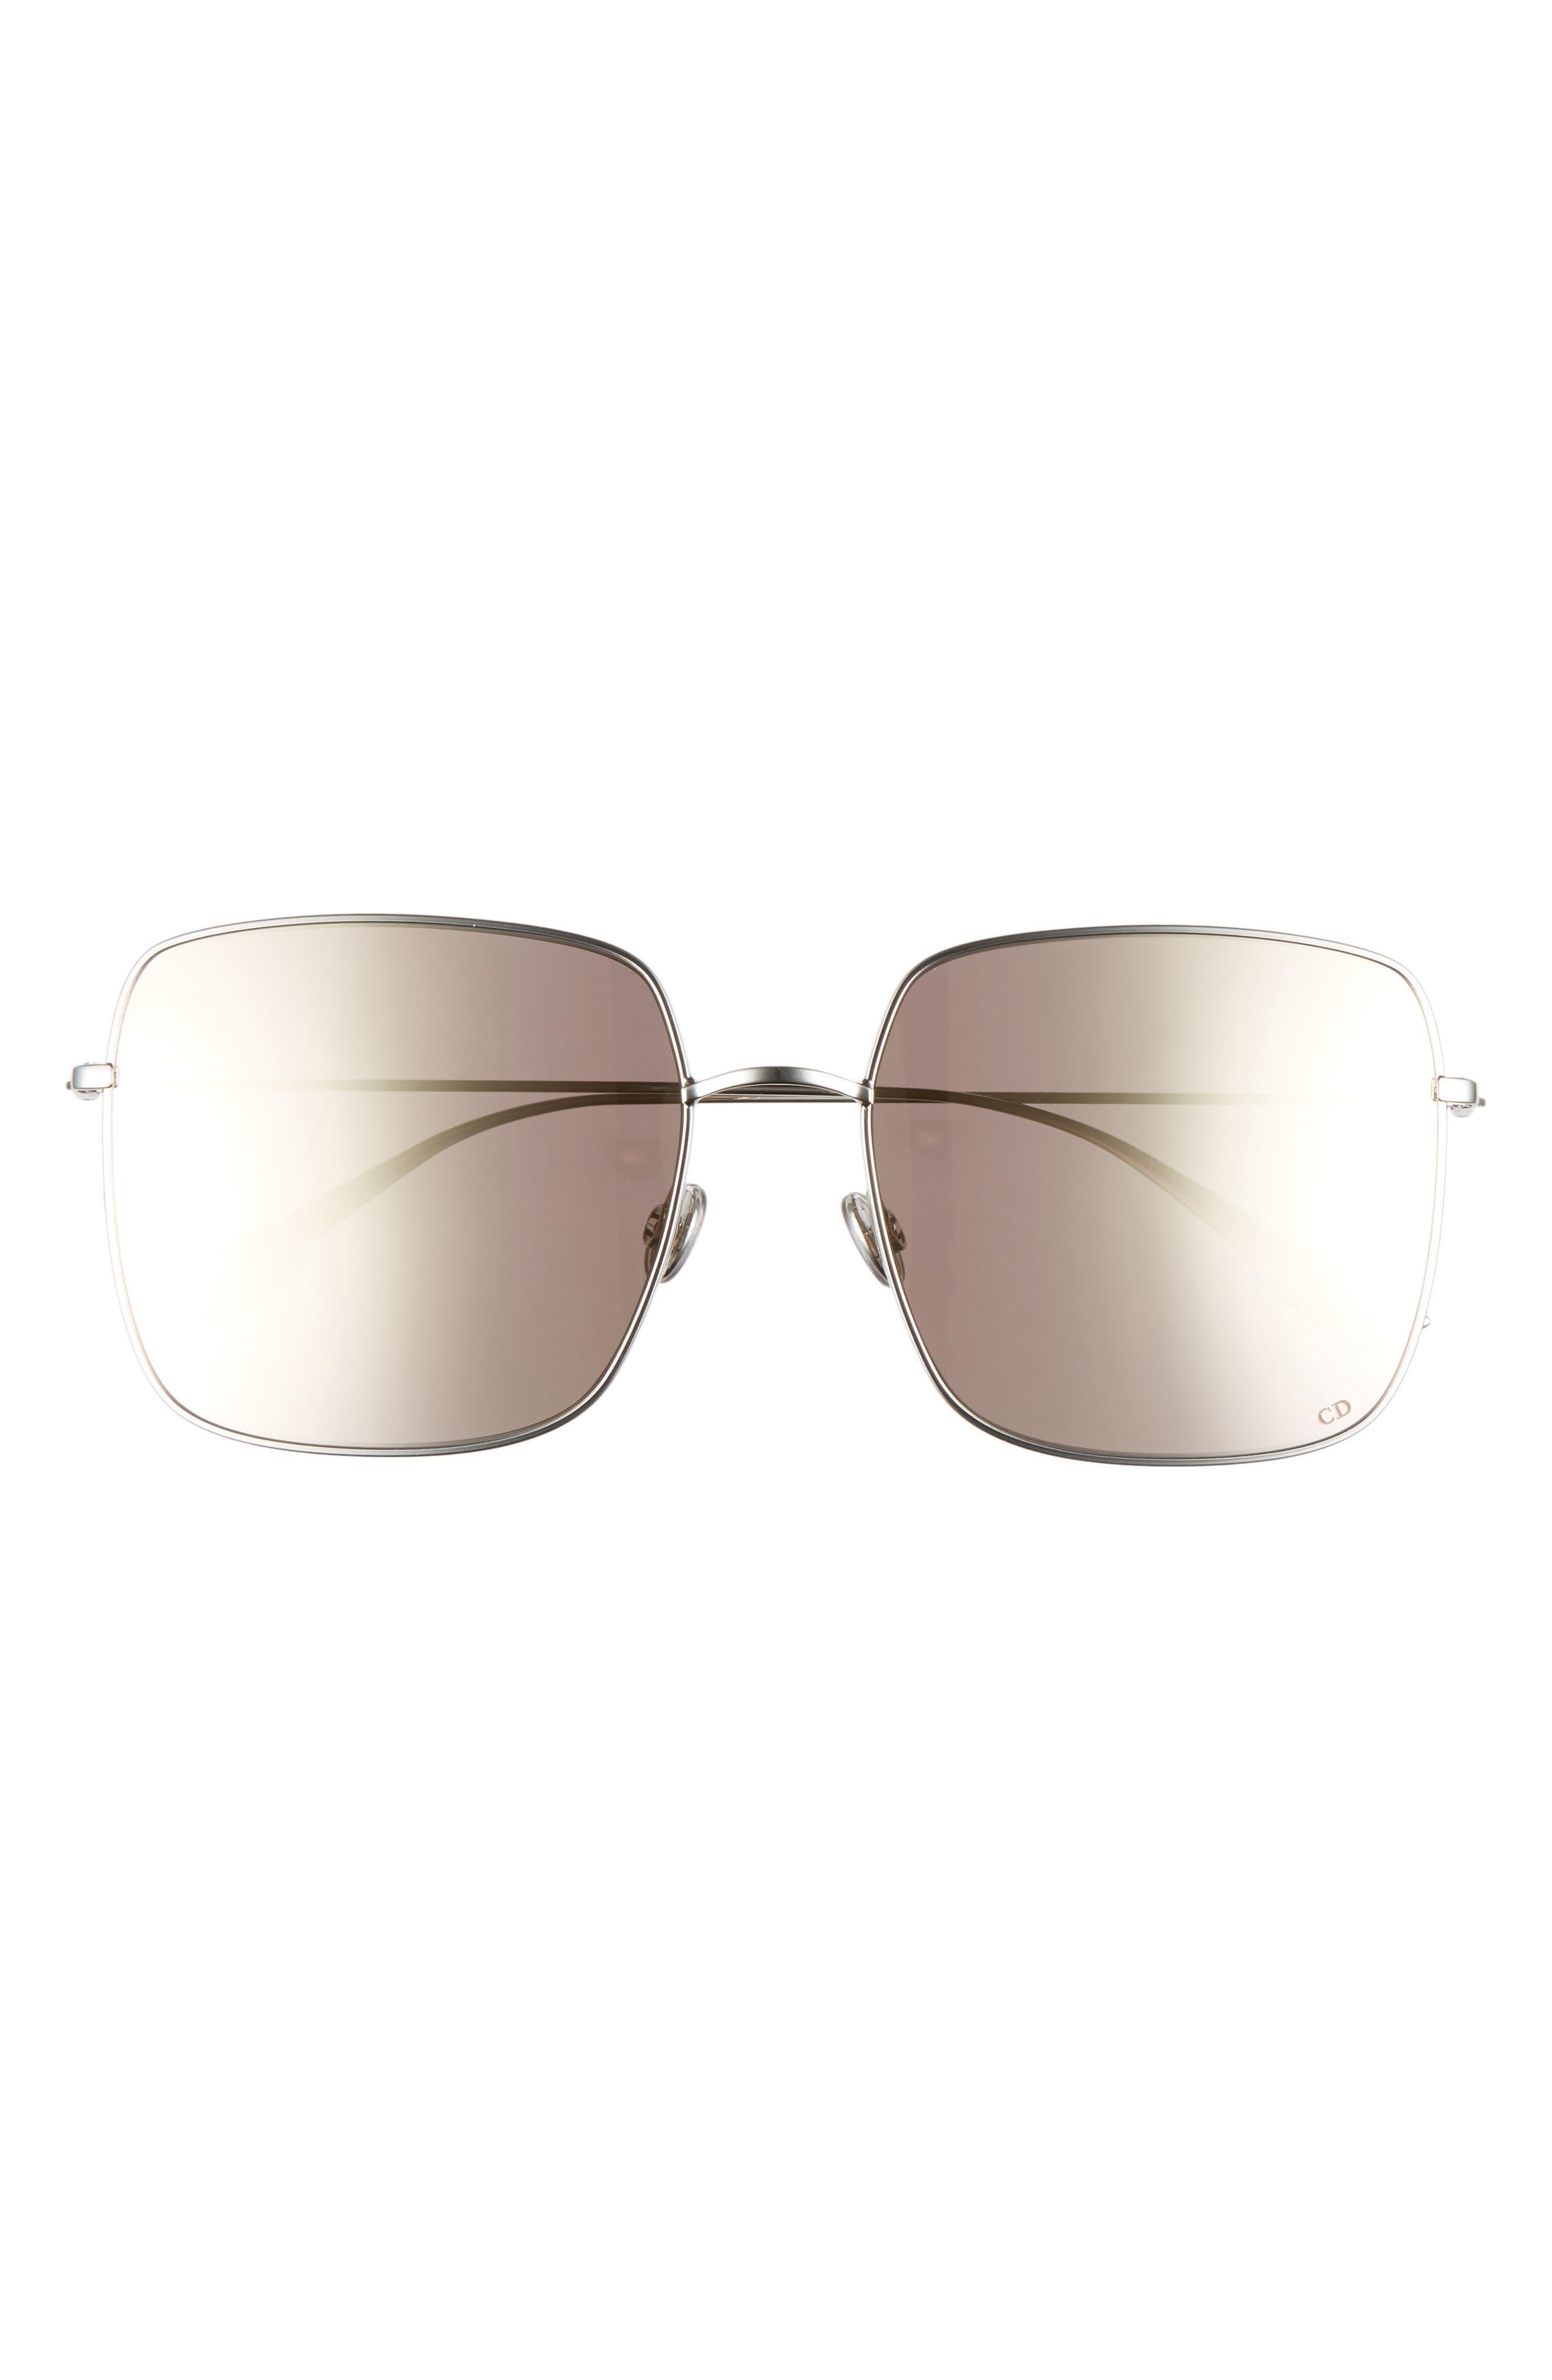 Stellaire 1 59mm Square Sunglasses,                             Alternate thumbnail 3, color,                             PALLADIUM